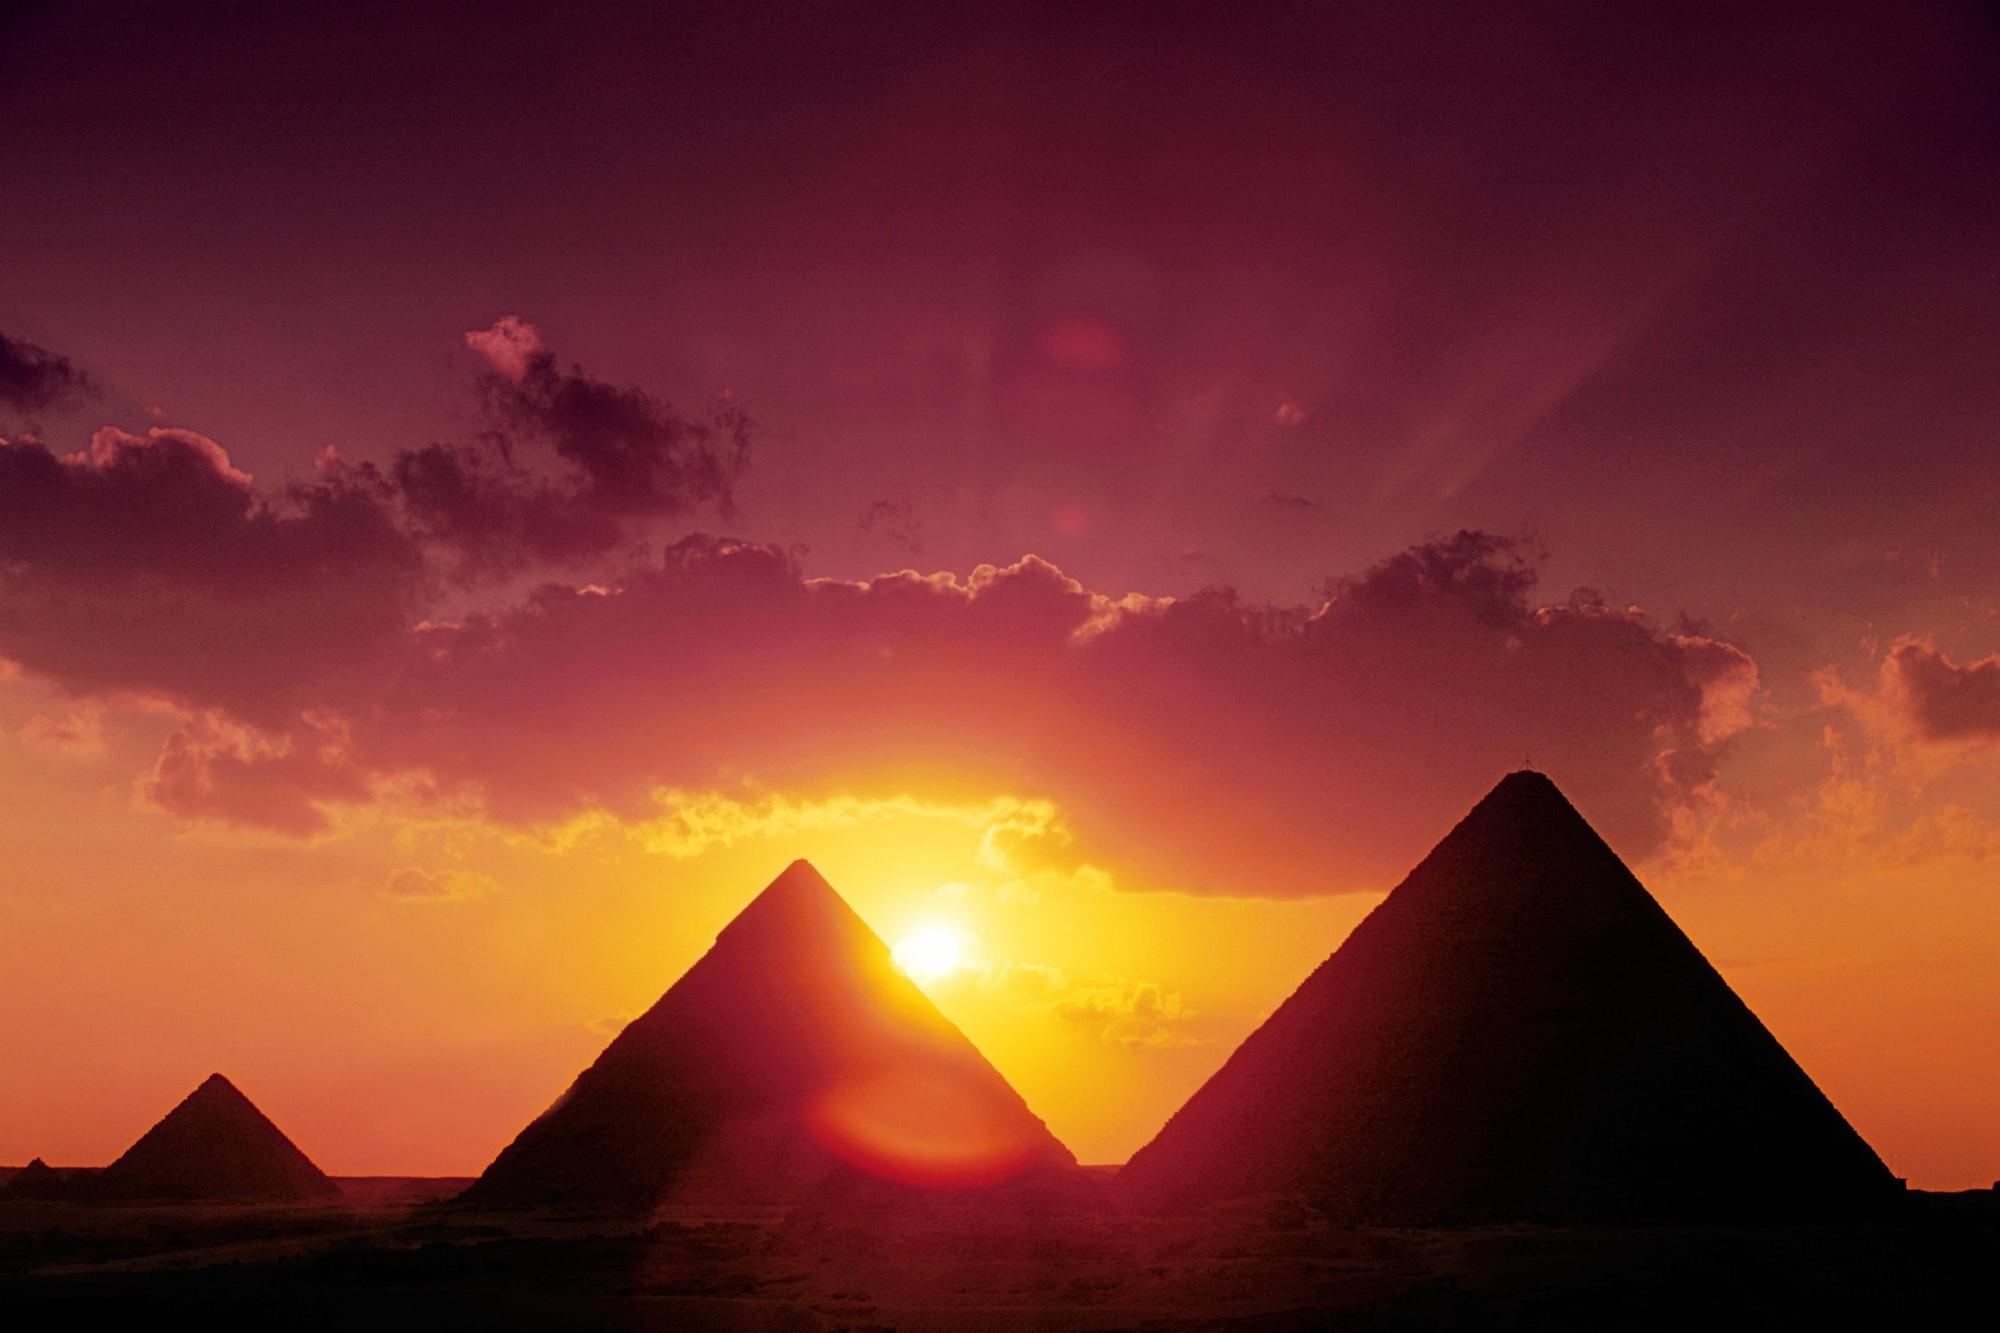 Piramides al atardecer - 2000x1333